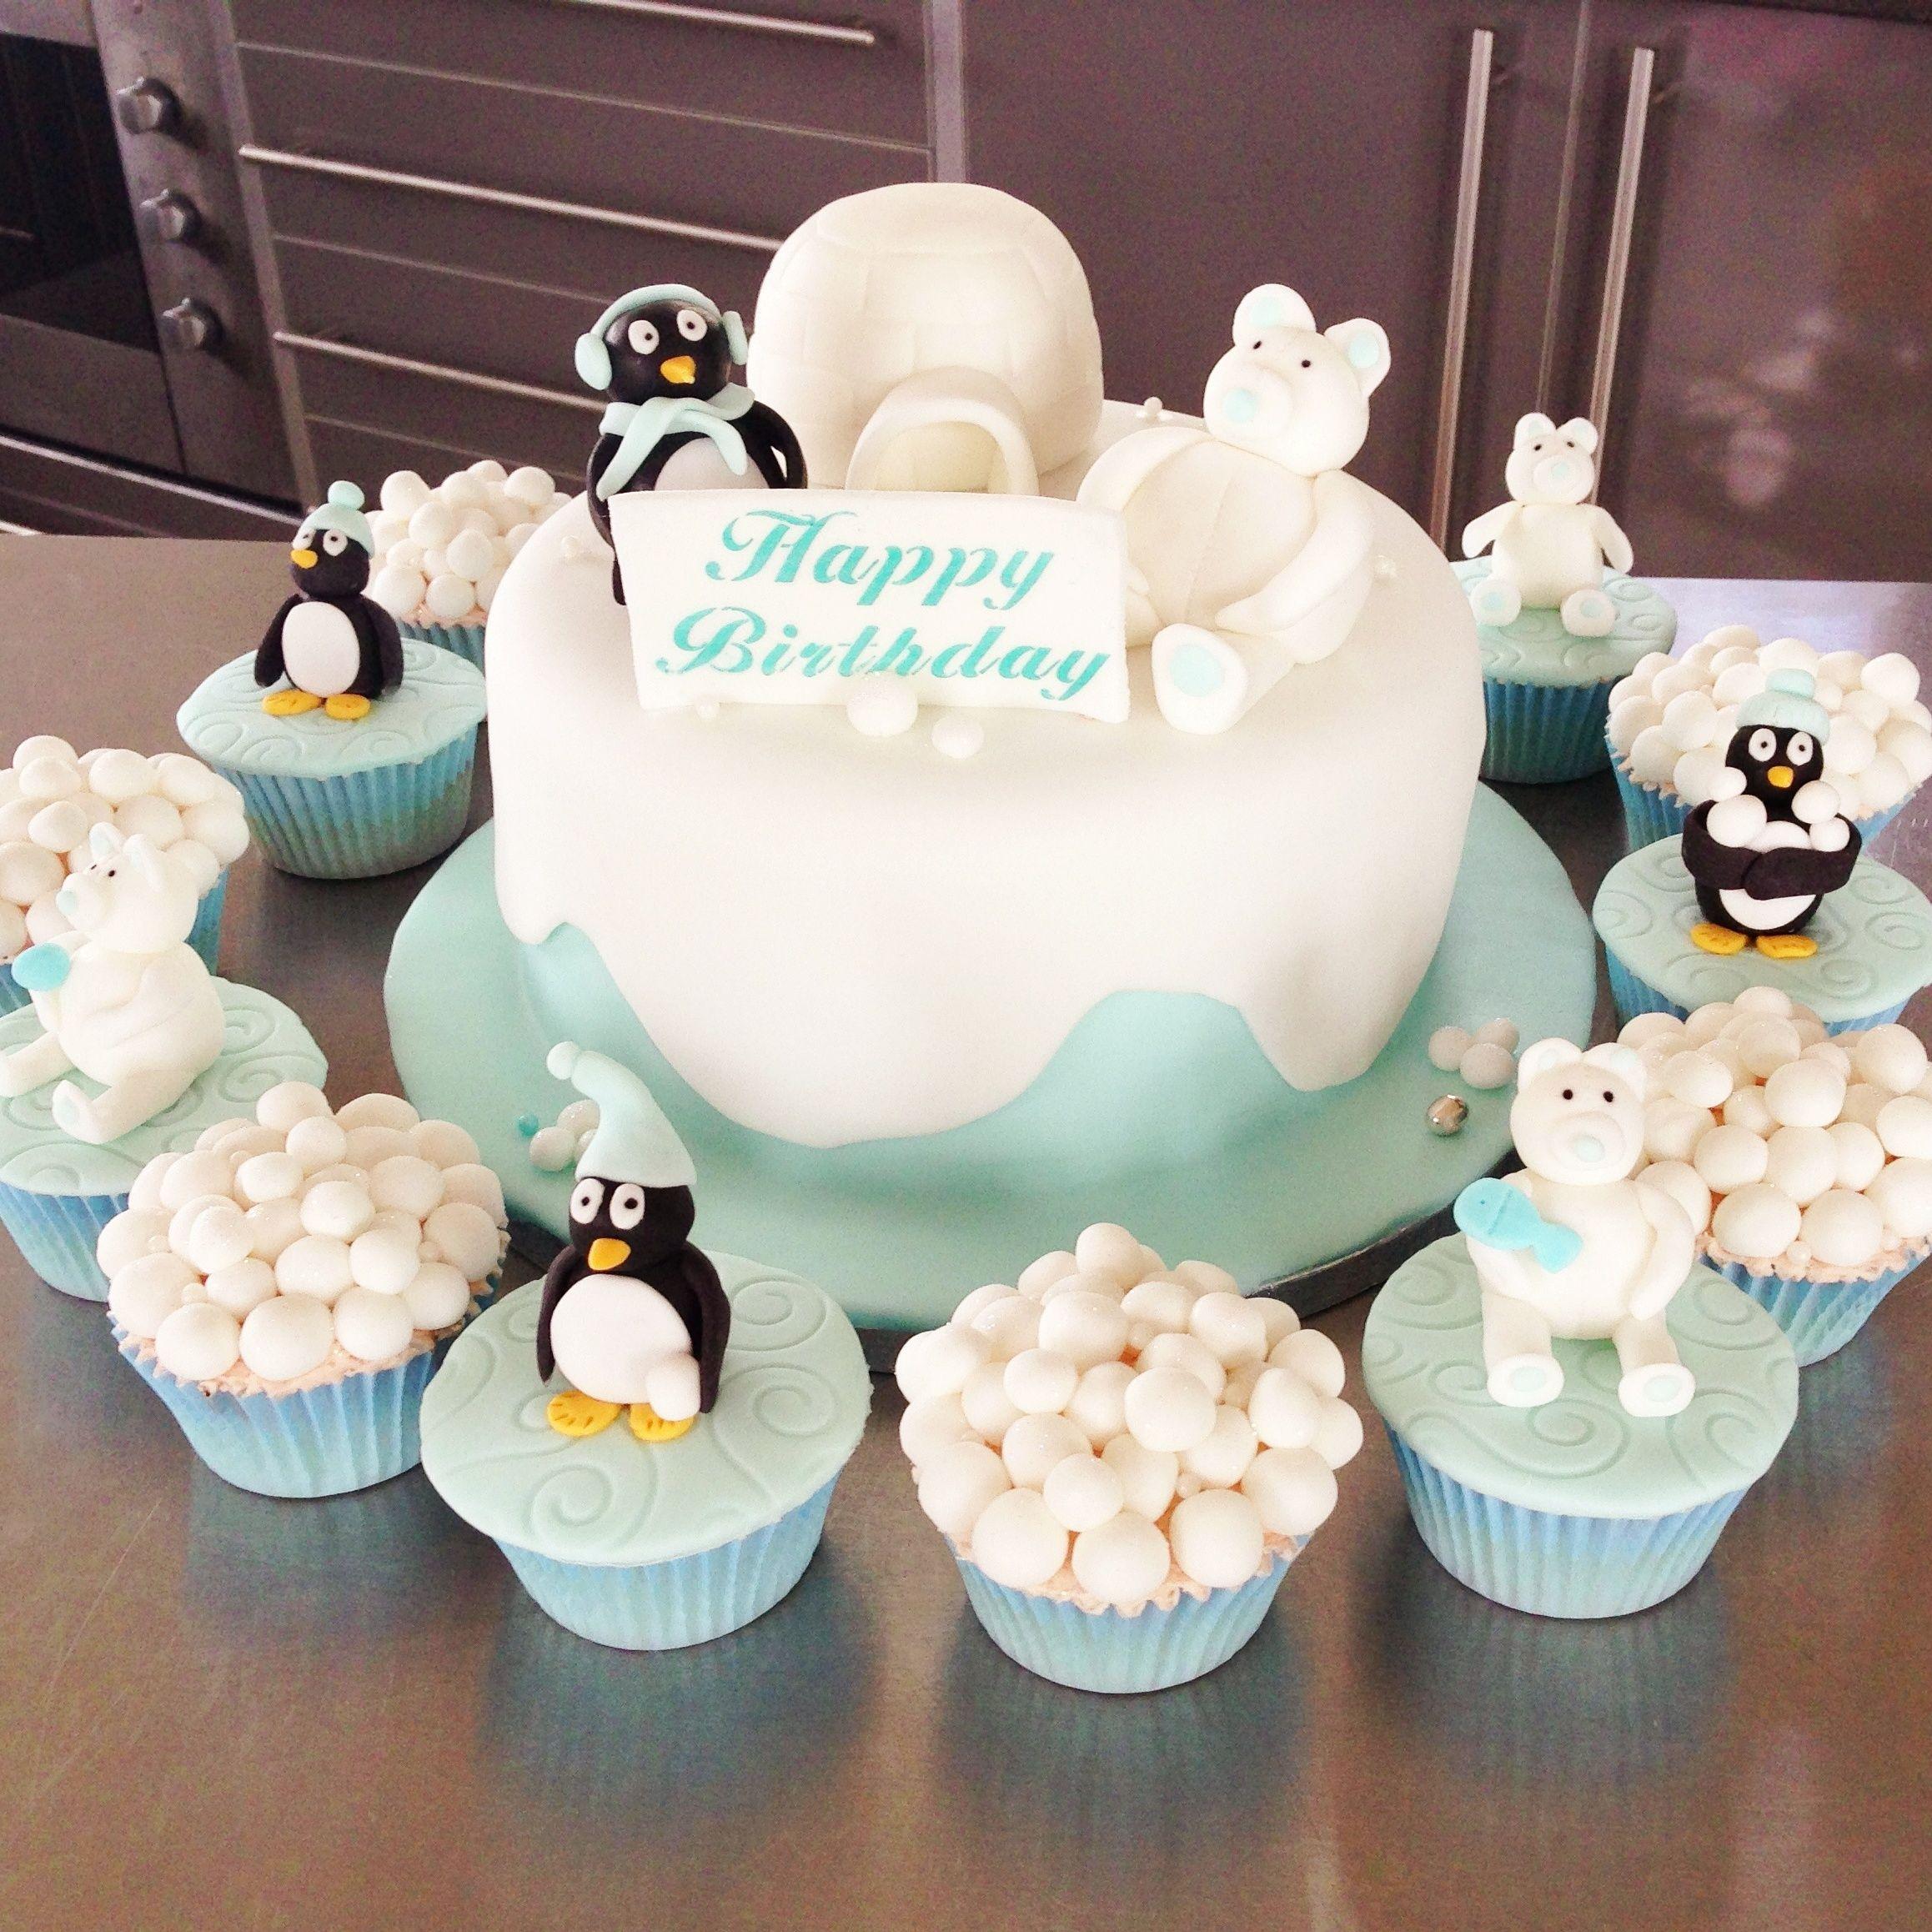 Amazing Penguin Birthday Cake Birthday Cake Penguin Birthday Fish Cake Funny Birthday Cards Online Alyptdamsfinfo